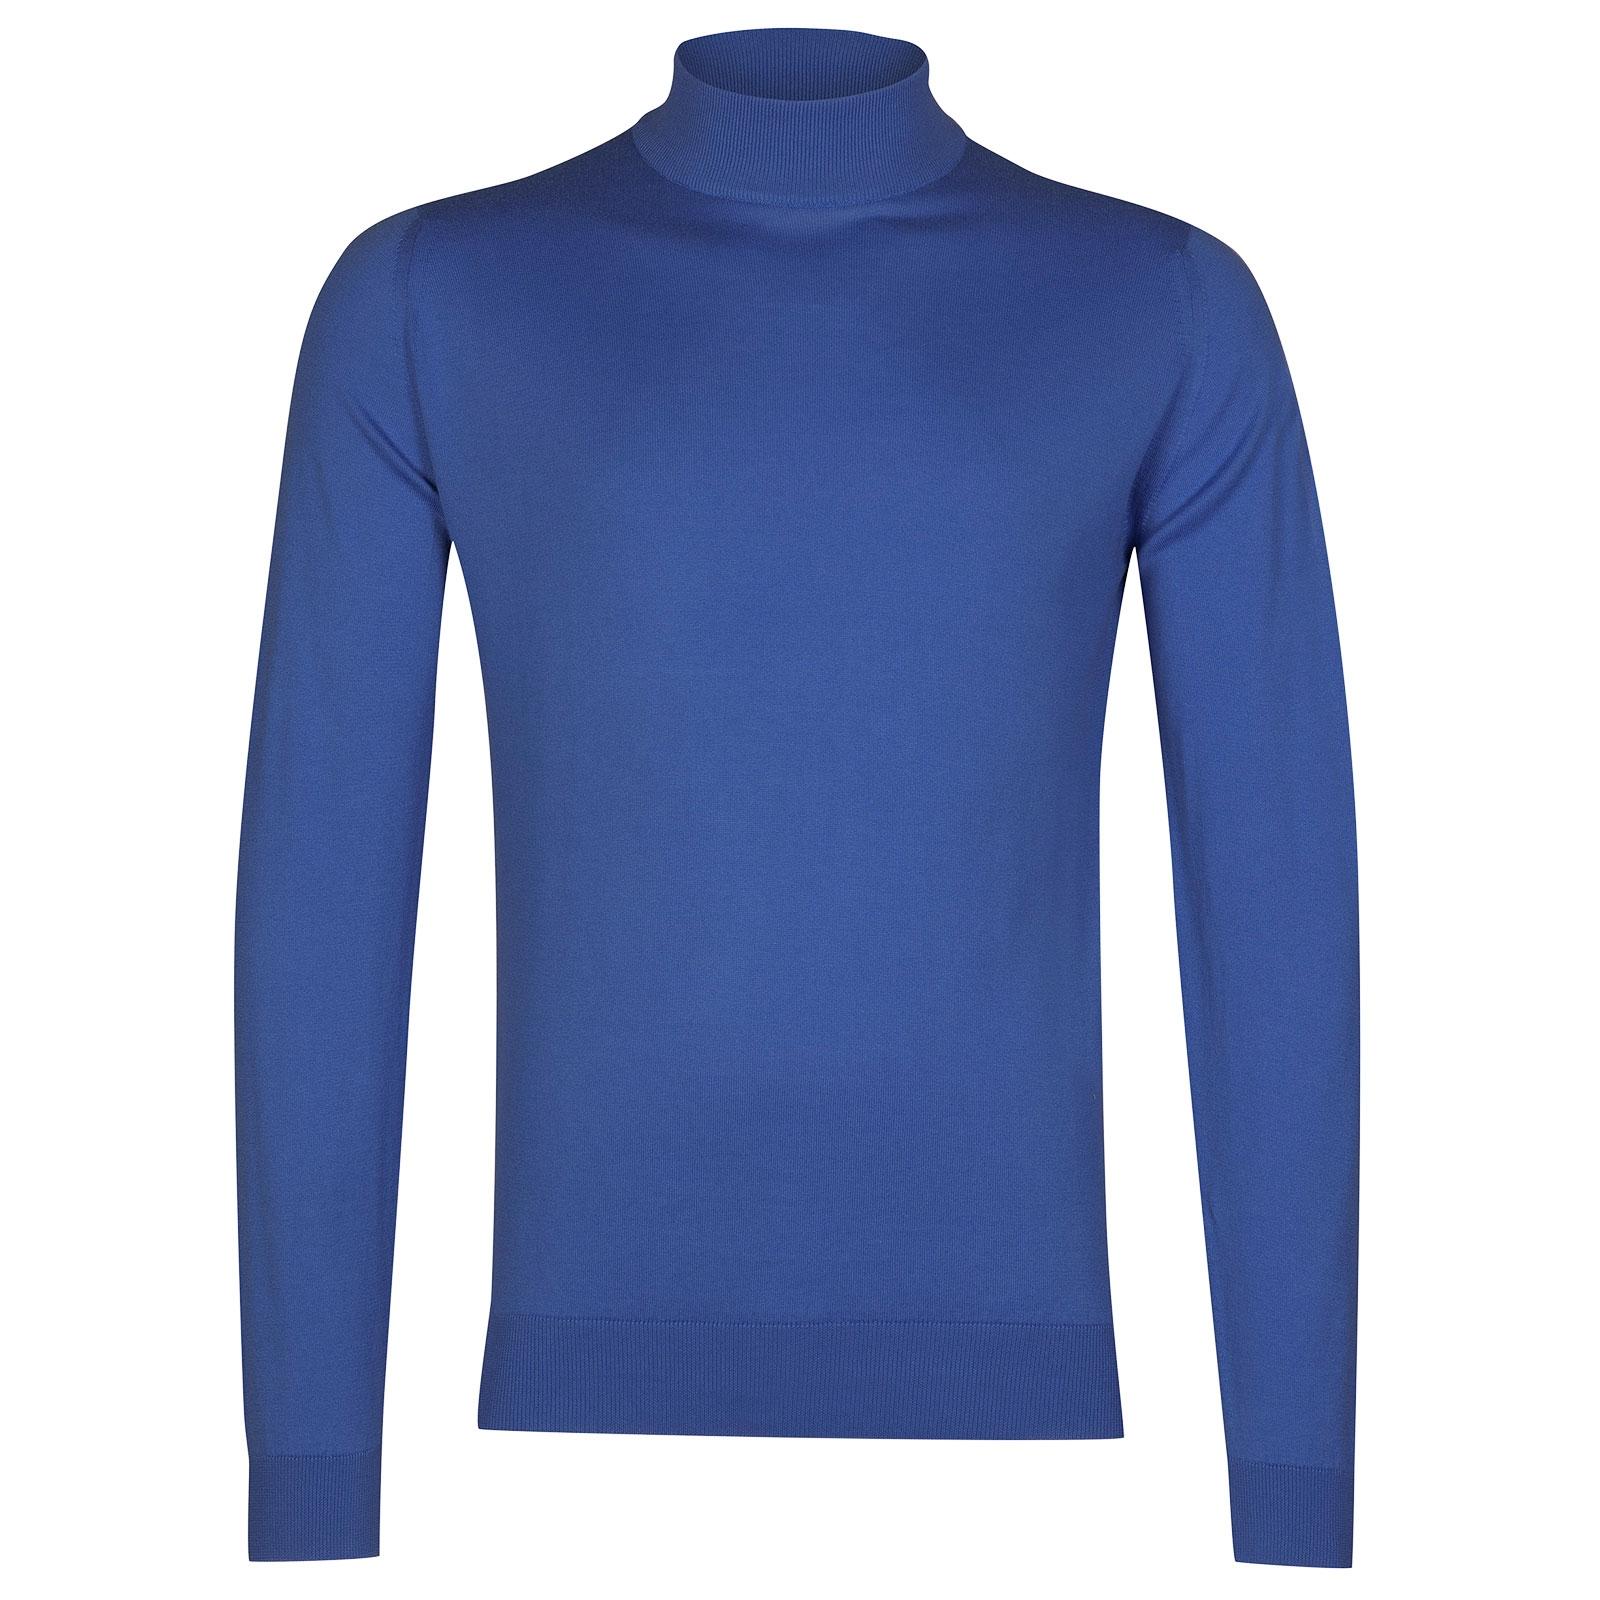 John Smedley Bradgate Sea Island Cotton Pullover in Chambray Blue-XXL